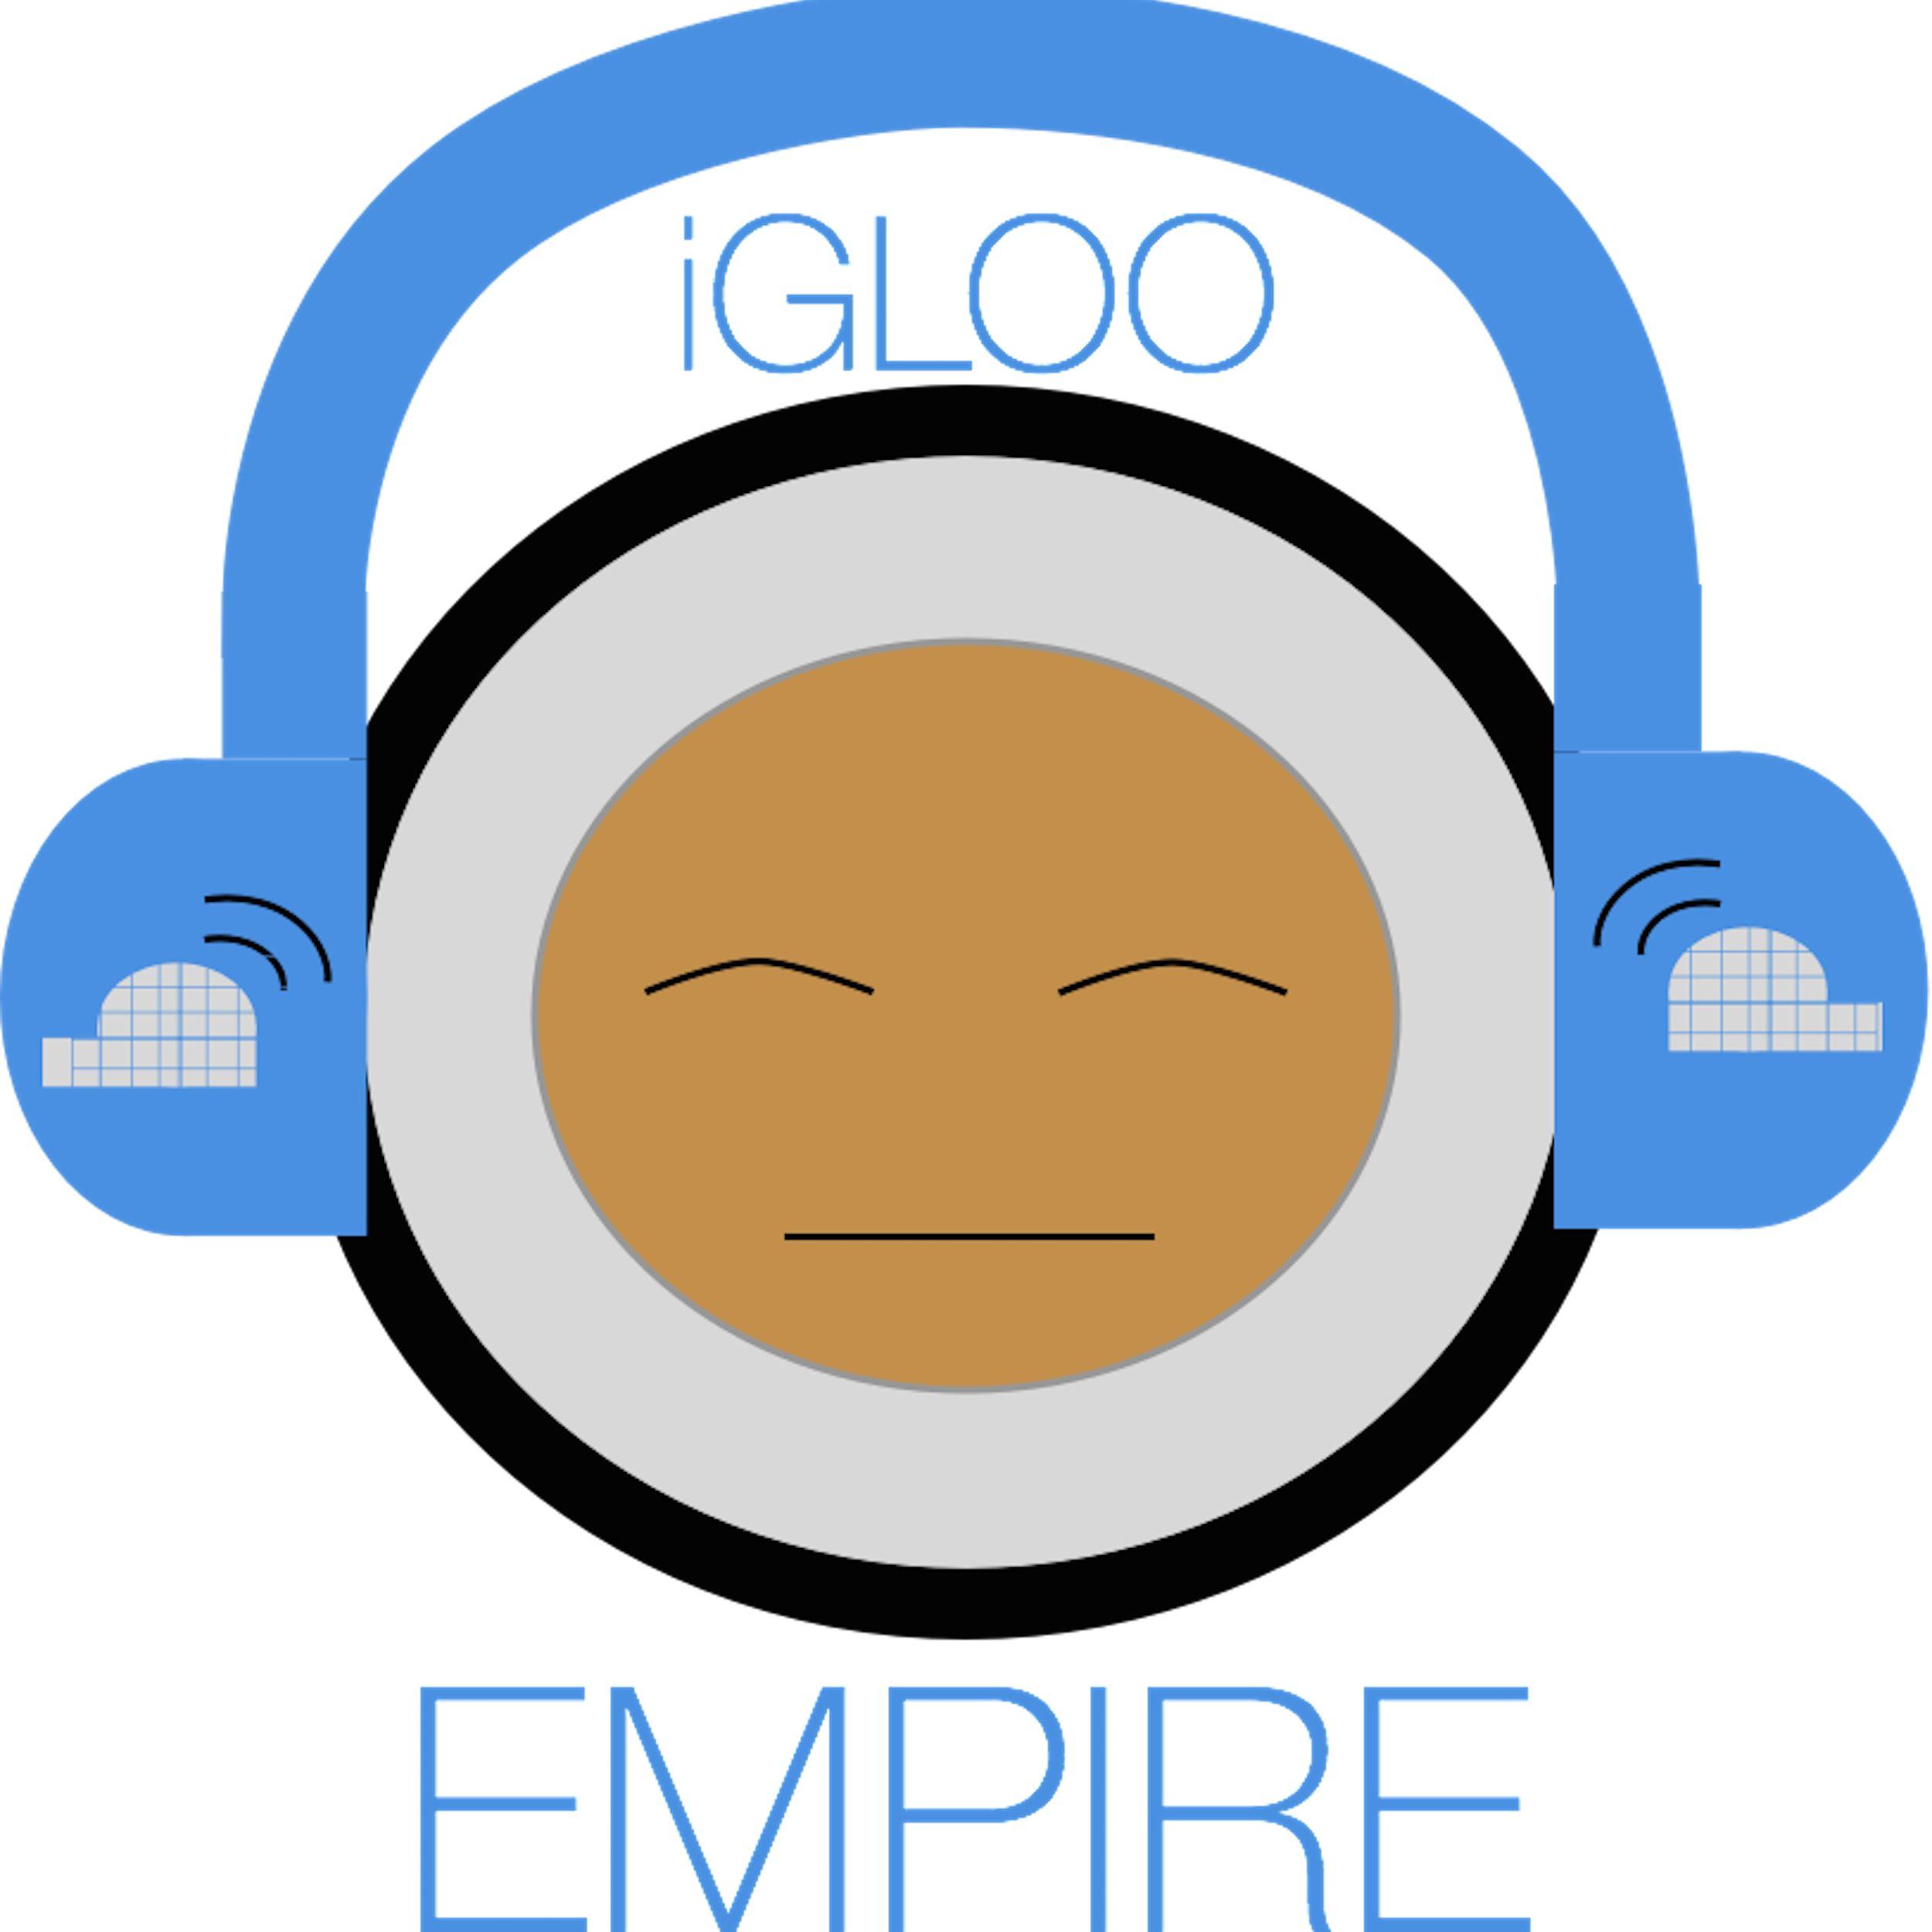 iGloo Empire